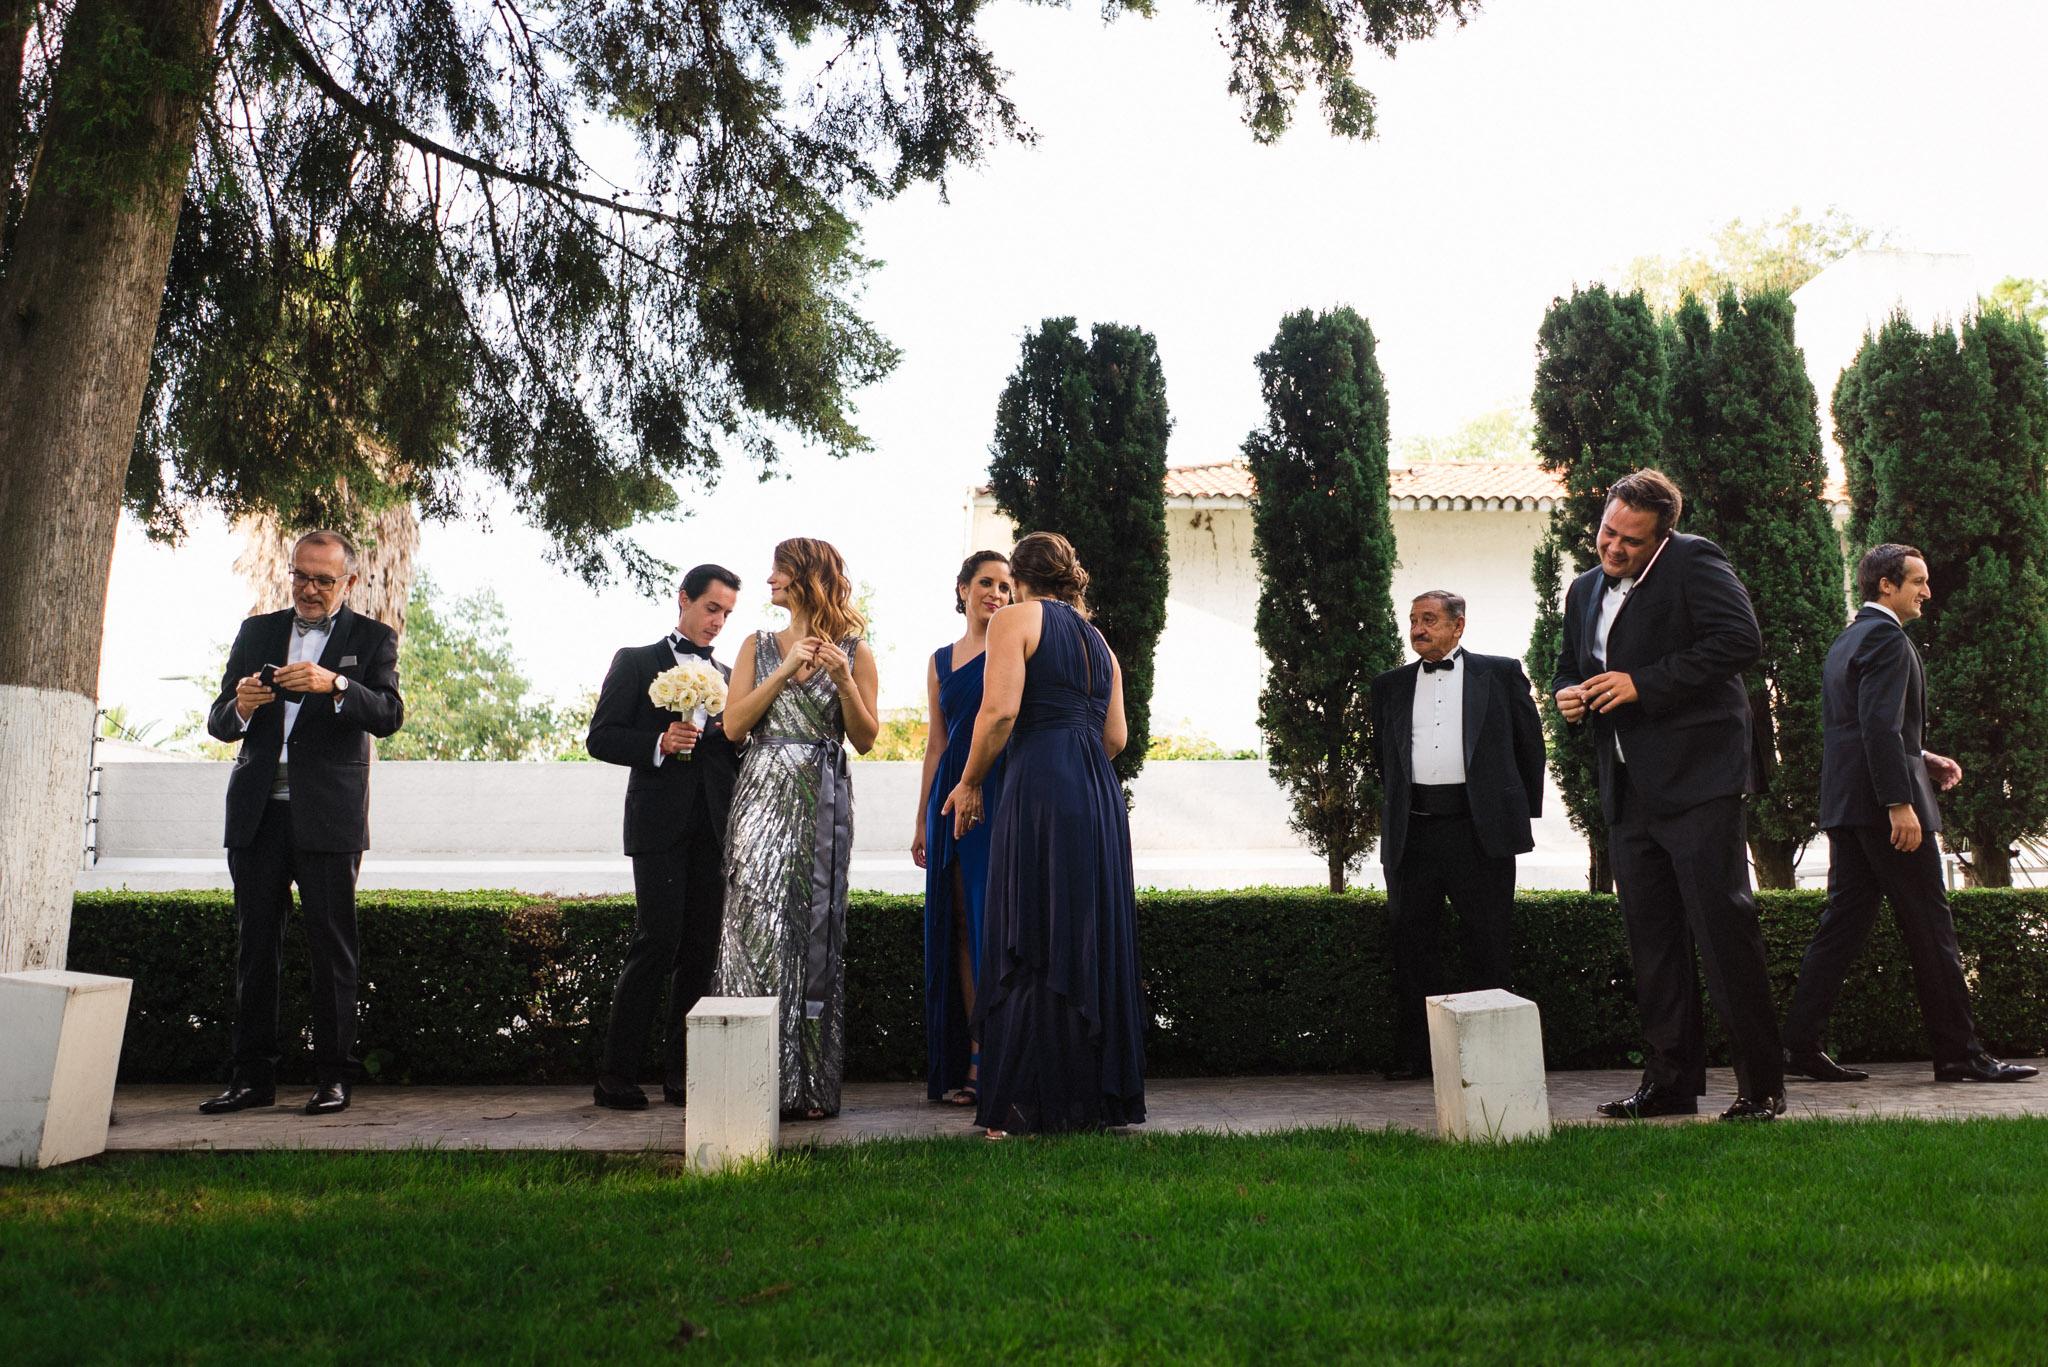 ©www.mauriziosolisbroca.com-20161001maurizio-solis-broca-mexico-canada-wedding-photographer20161001DSC07085-2-Edit.jpg